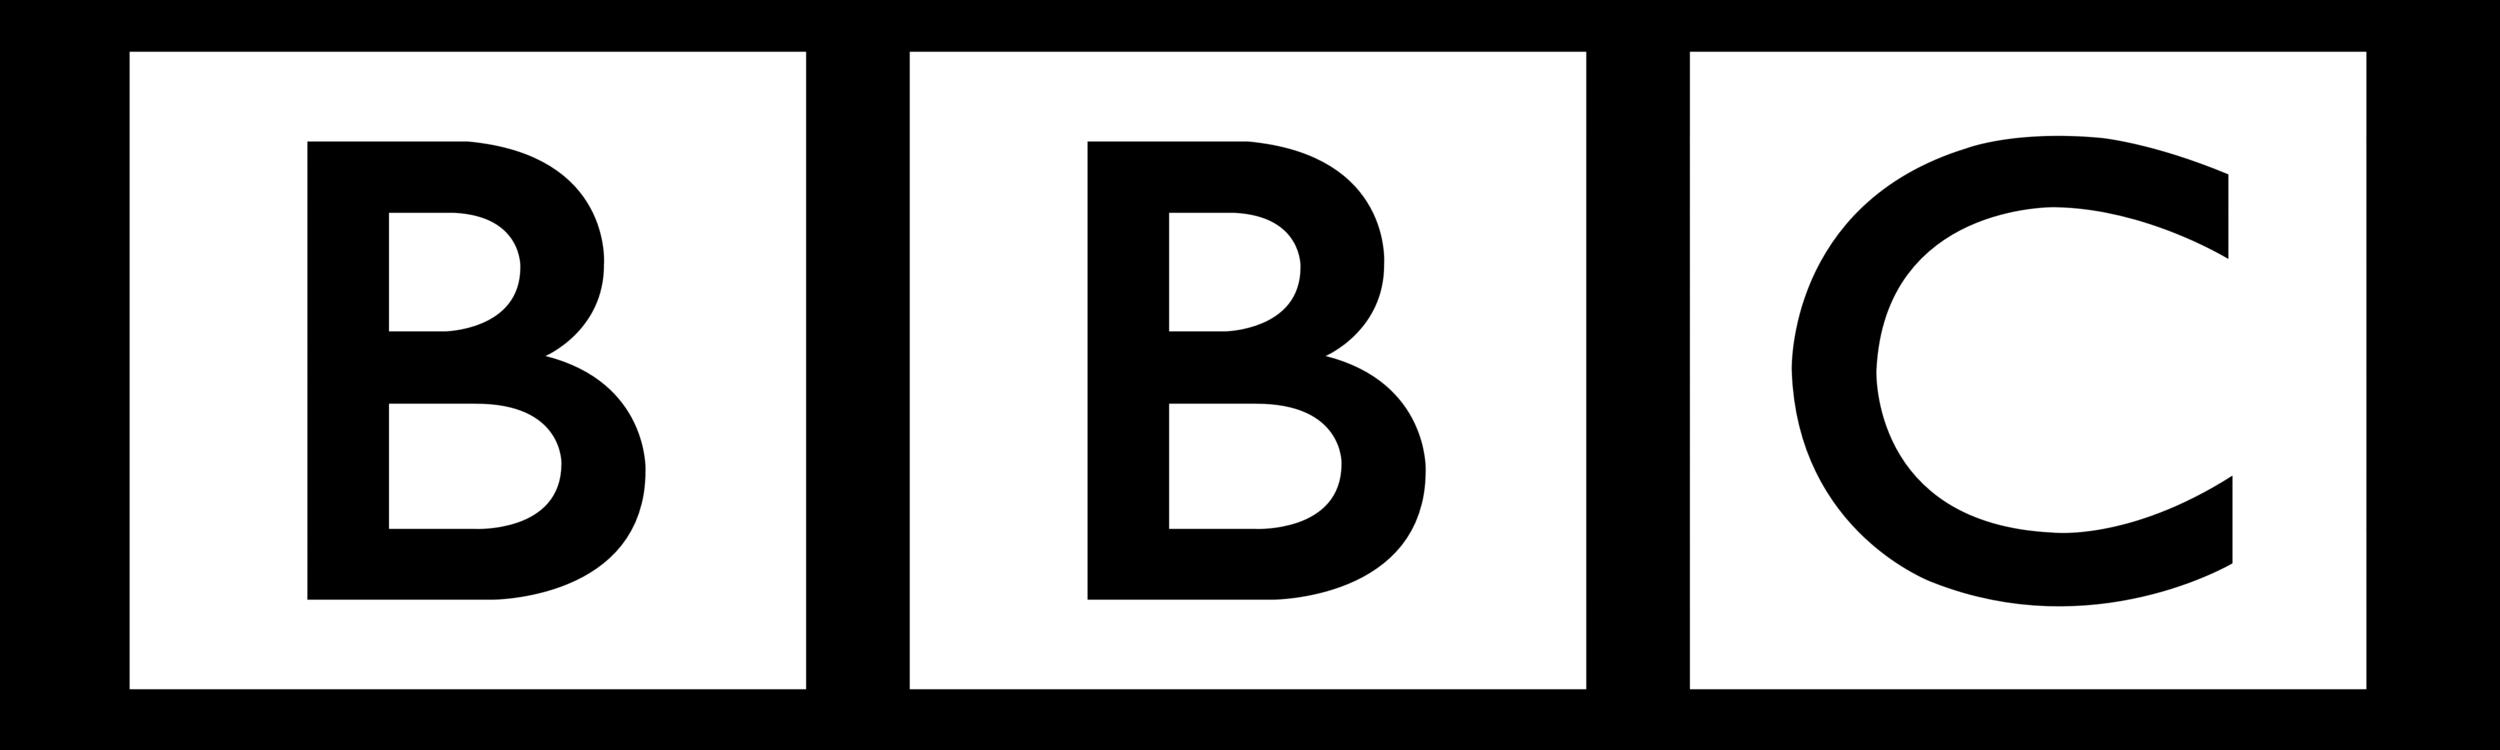 BBC_logo_black_background.png